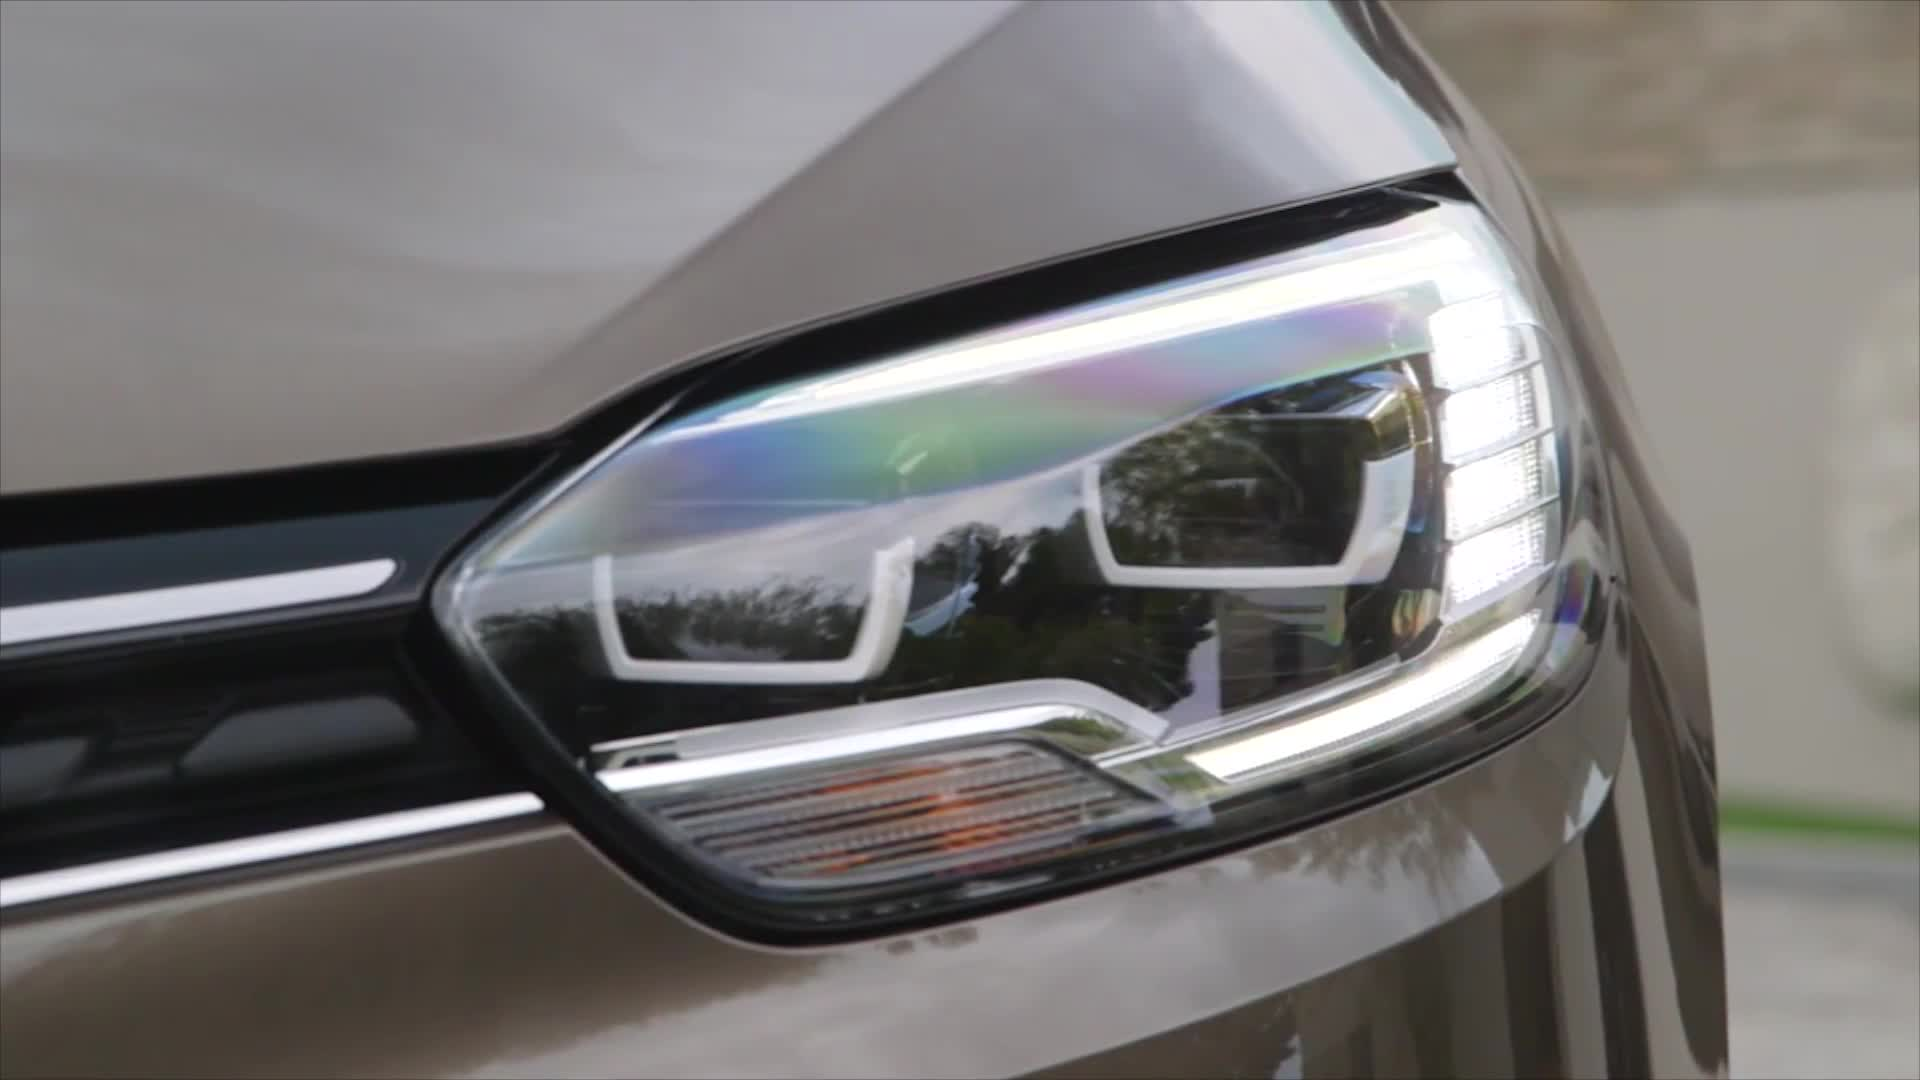 New 2016 Renault GRAND SCENIC Exterior Design